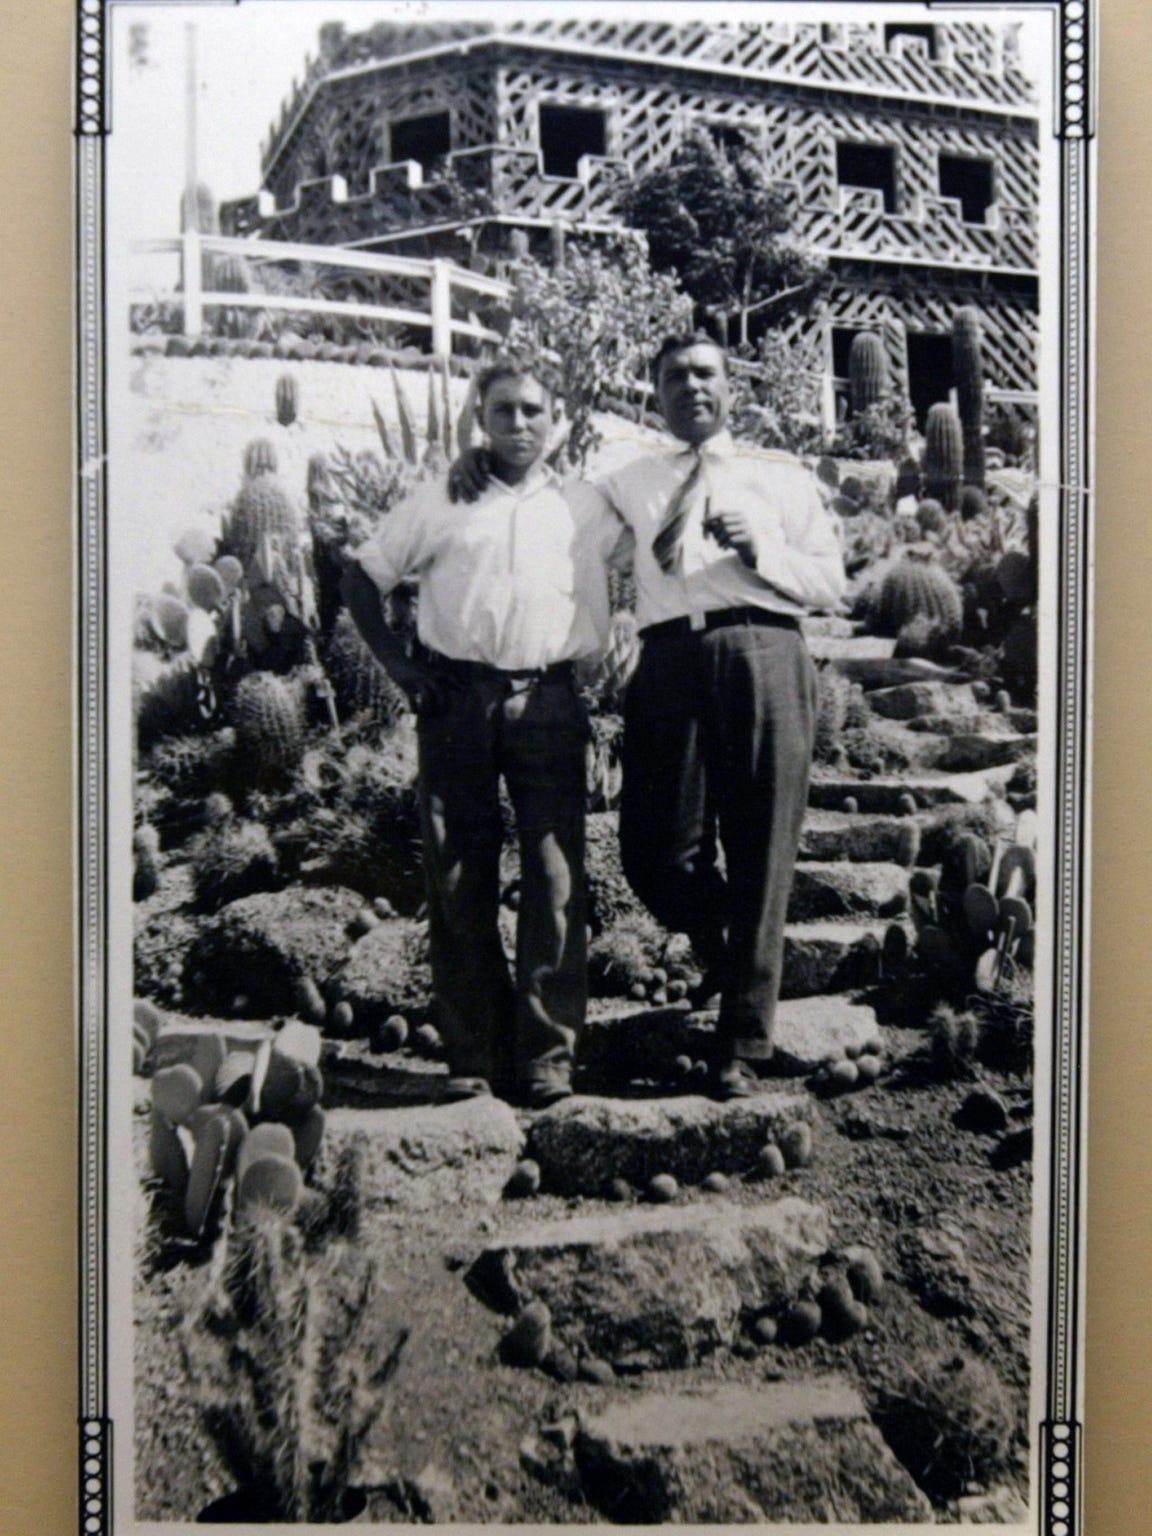 A photo of Alessio and Leo Carraro, circa 1930, on display at the historic Tovrea Castle in Phoenix.